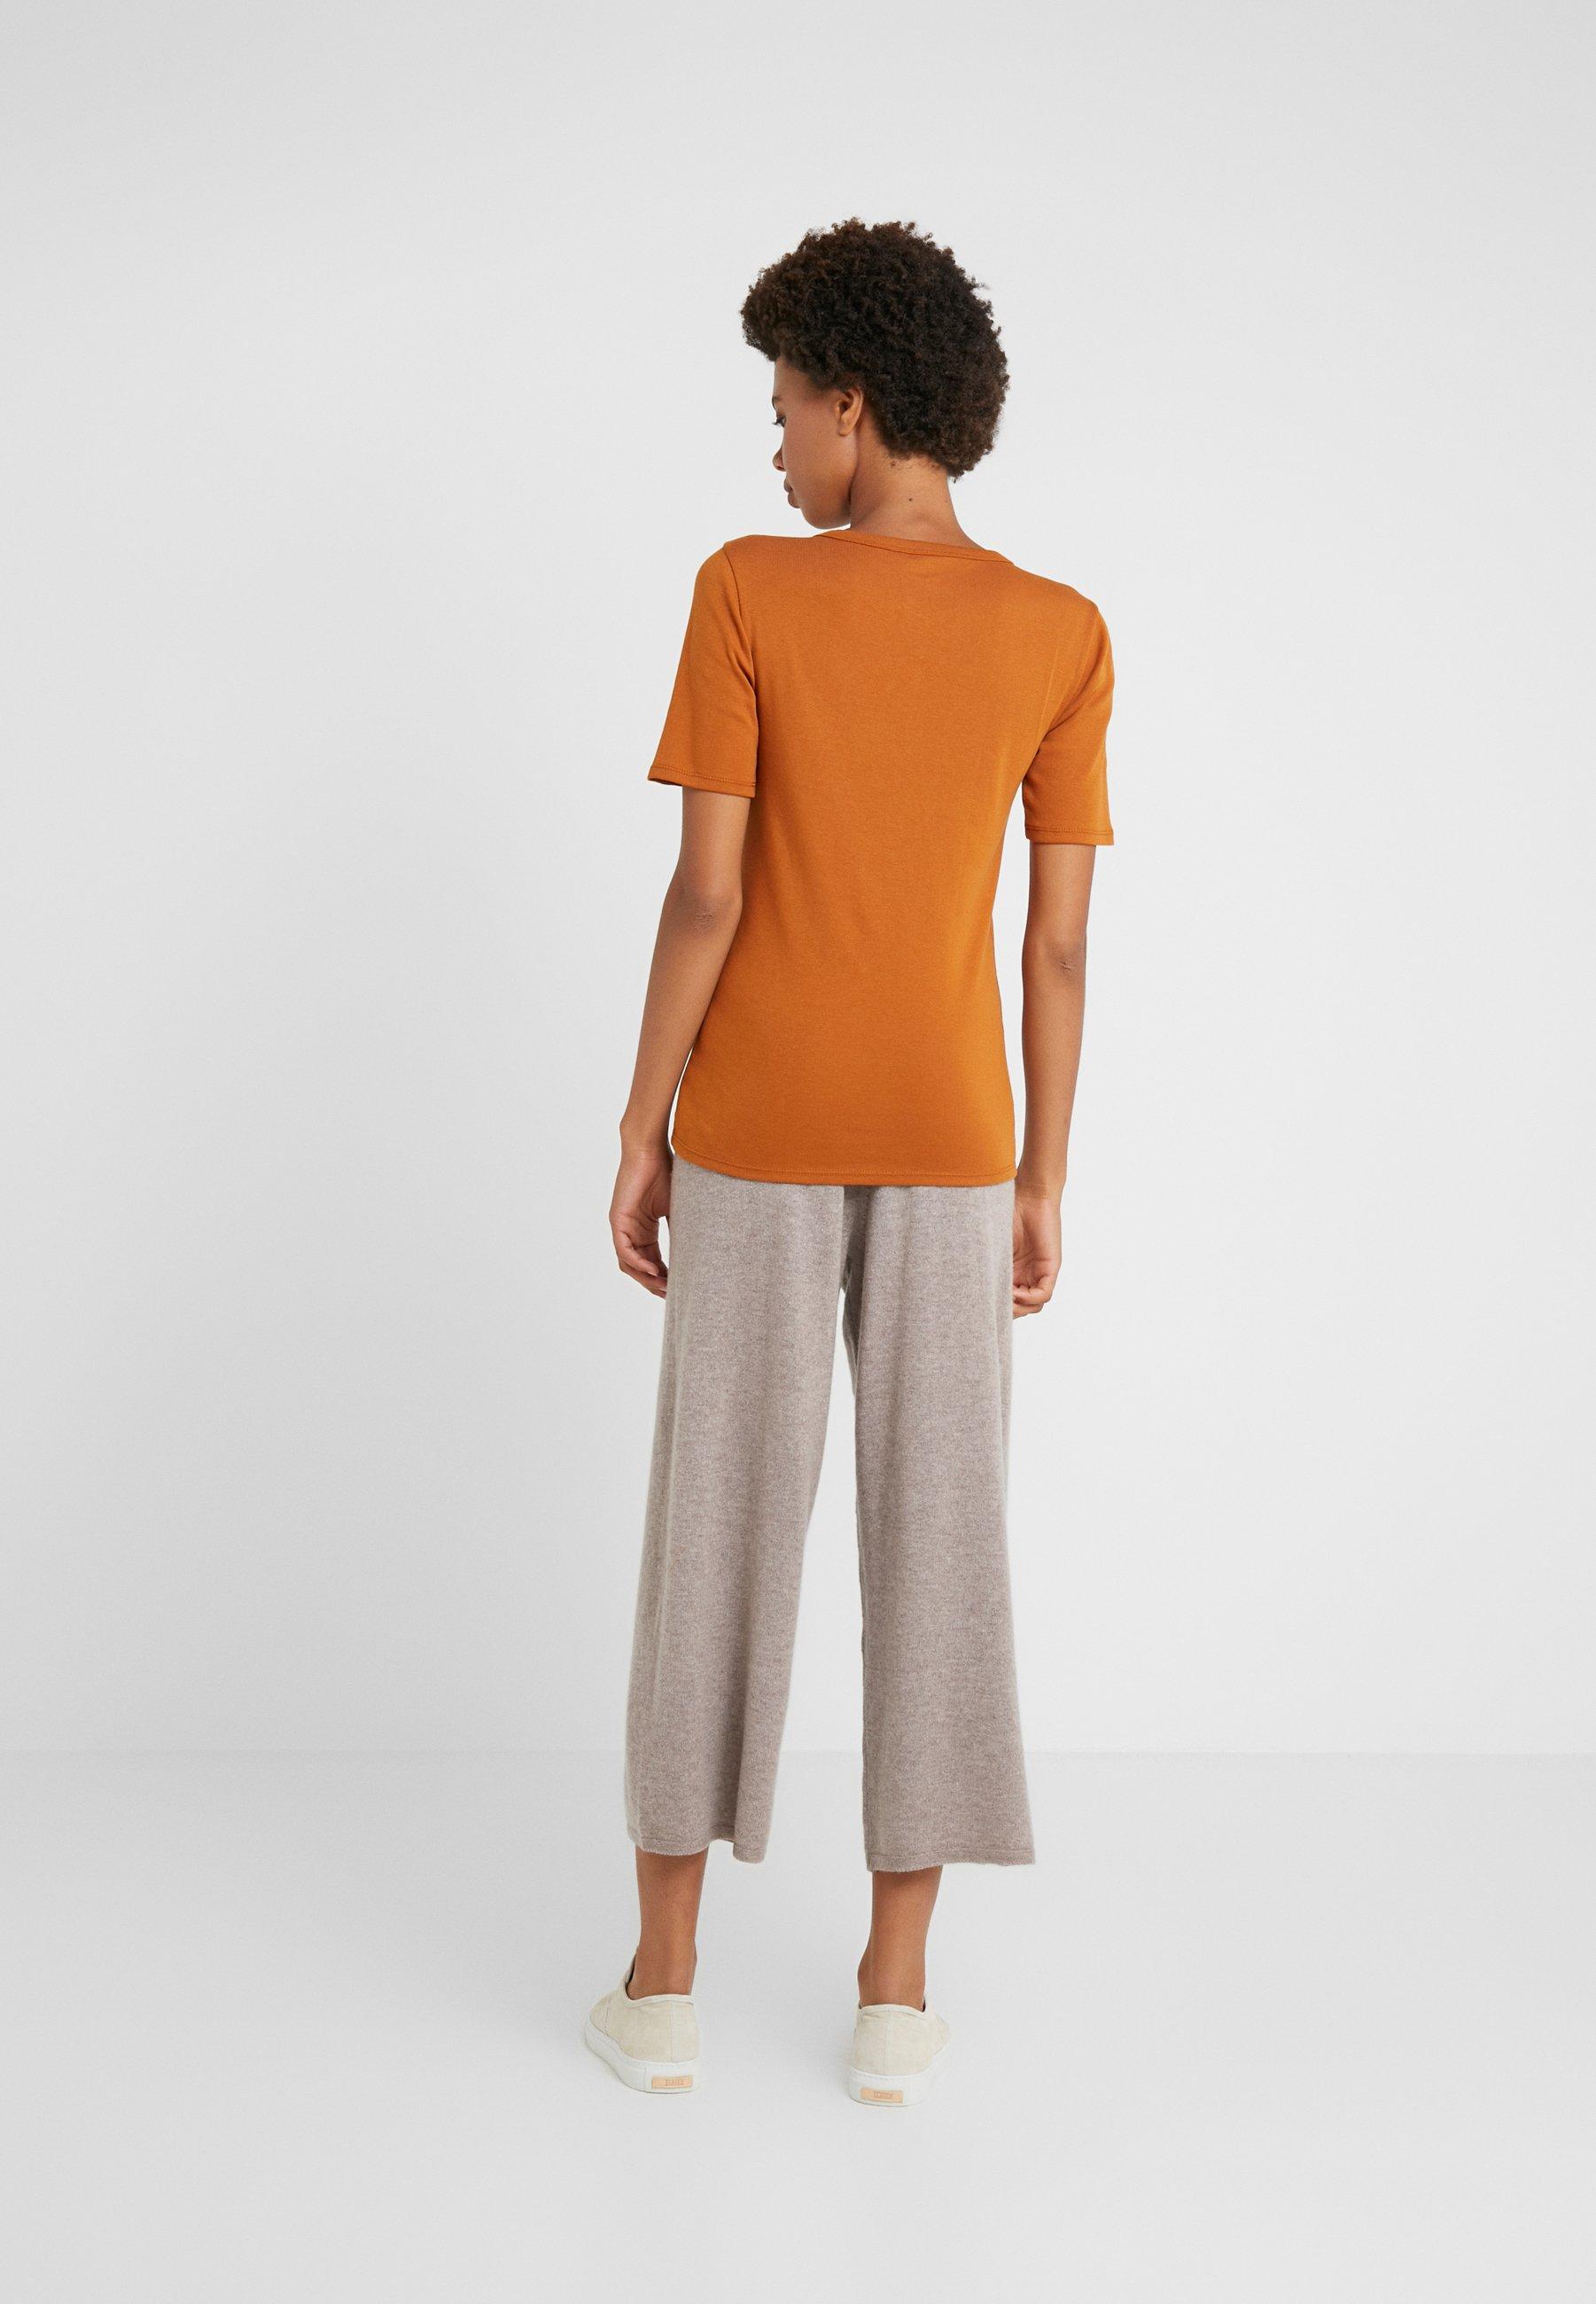 J.CREW T-shirt imprimé adobe